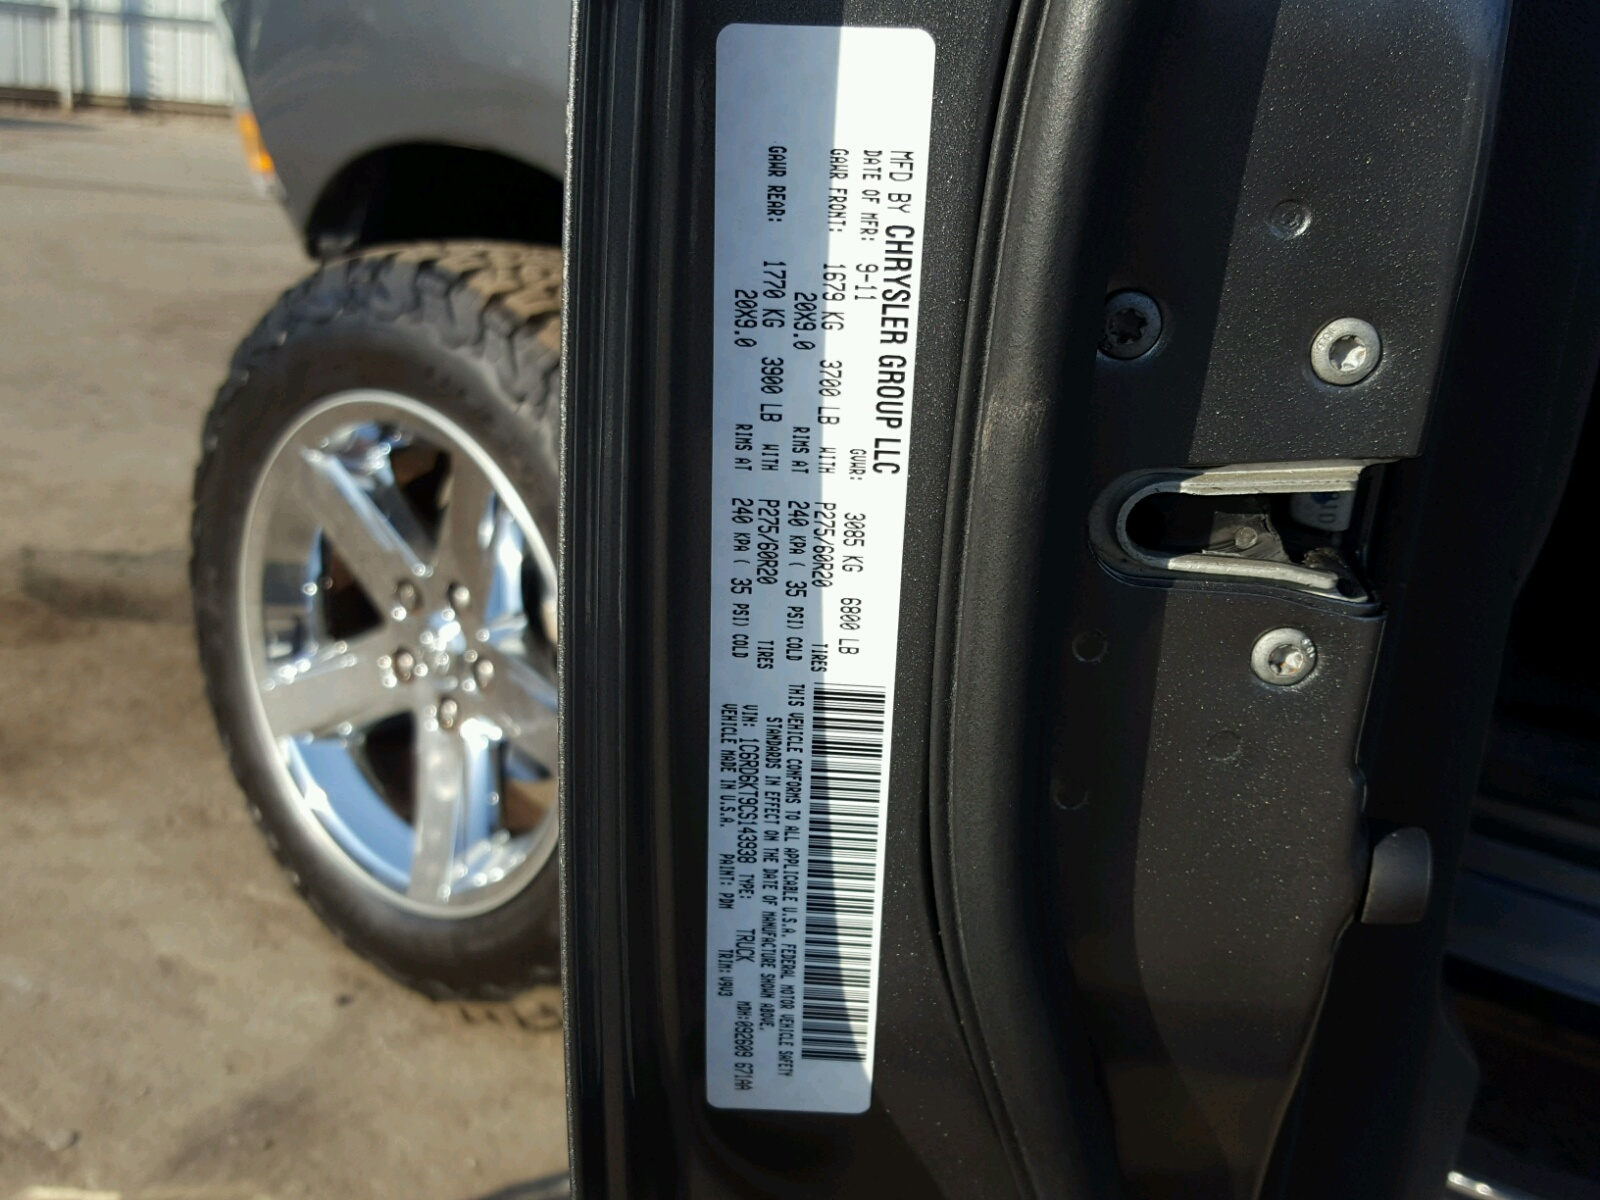 2012 Dodge Ram 1500 S For Sale At Copart Spartanburg Sc Lot 45345238 Wheels